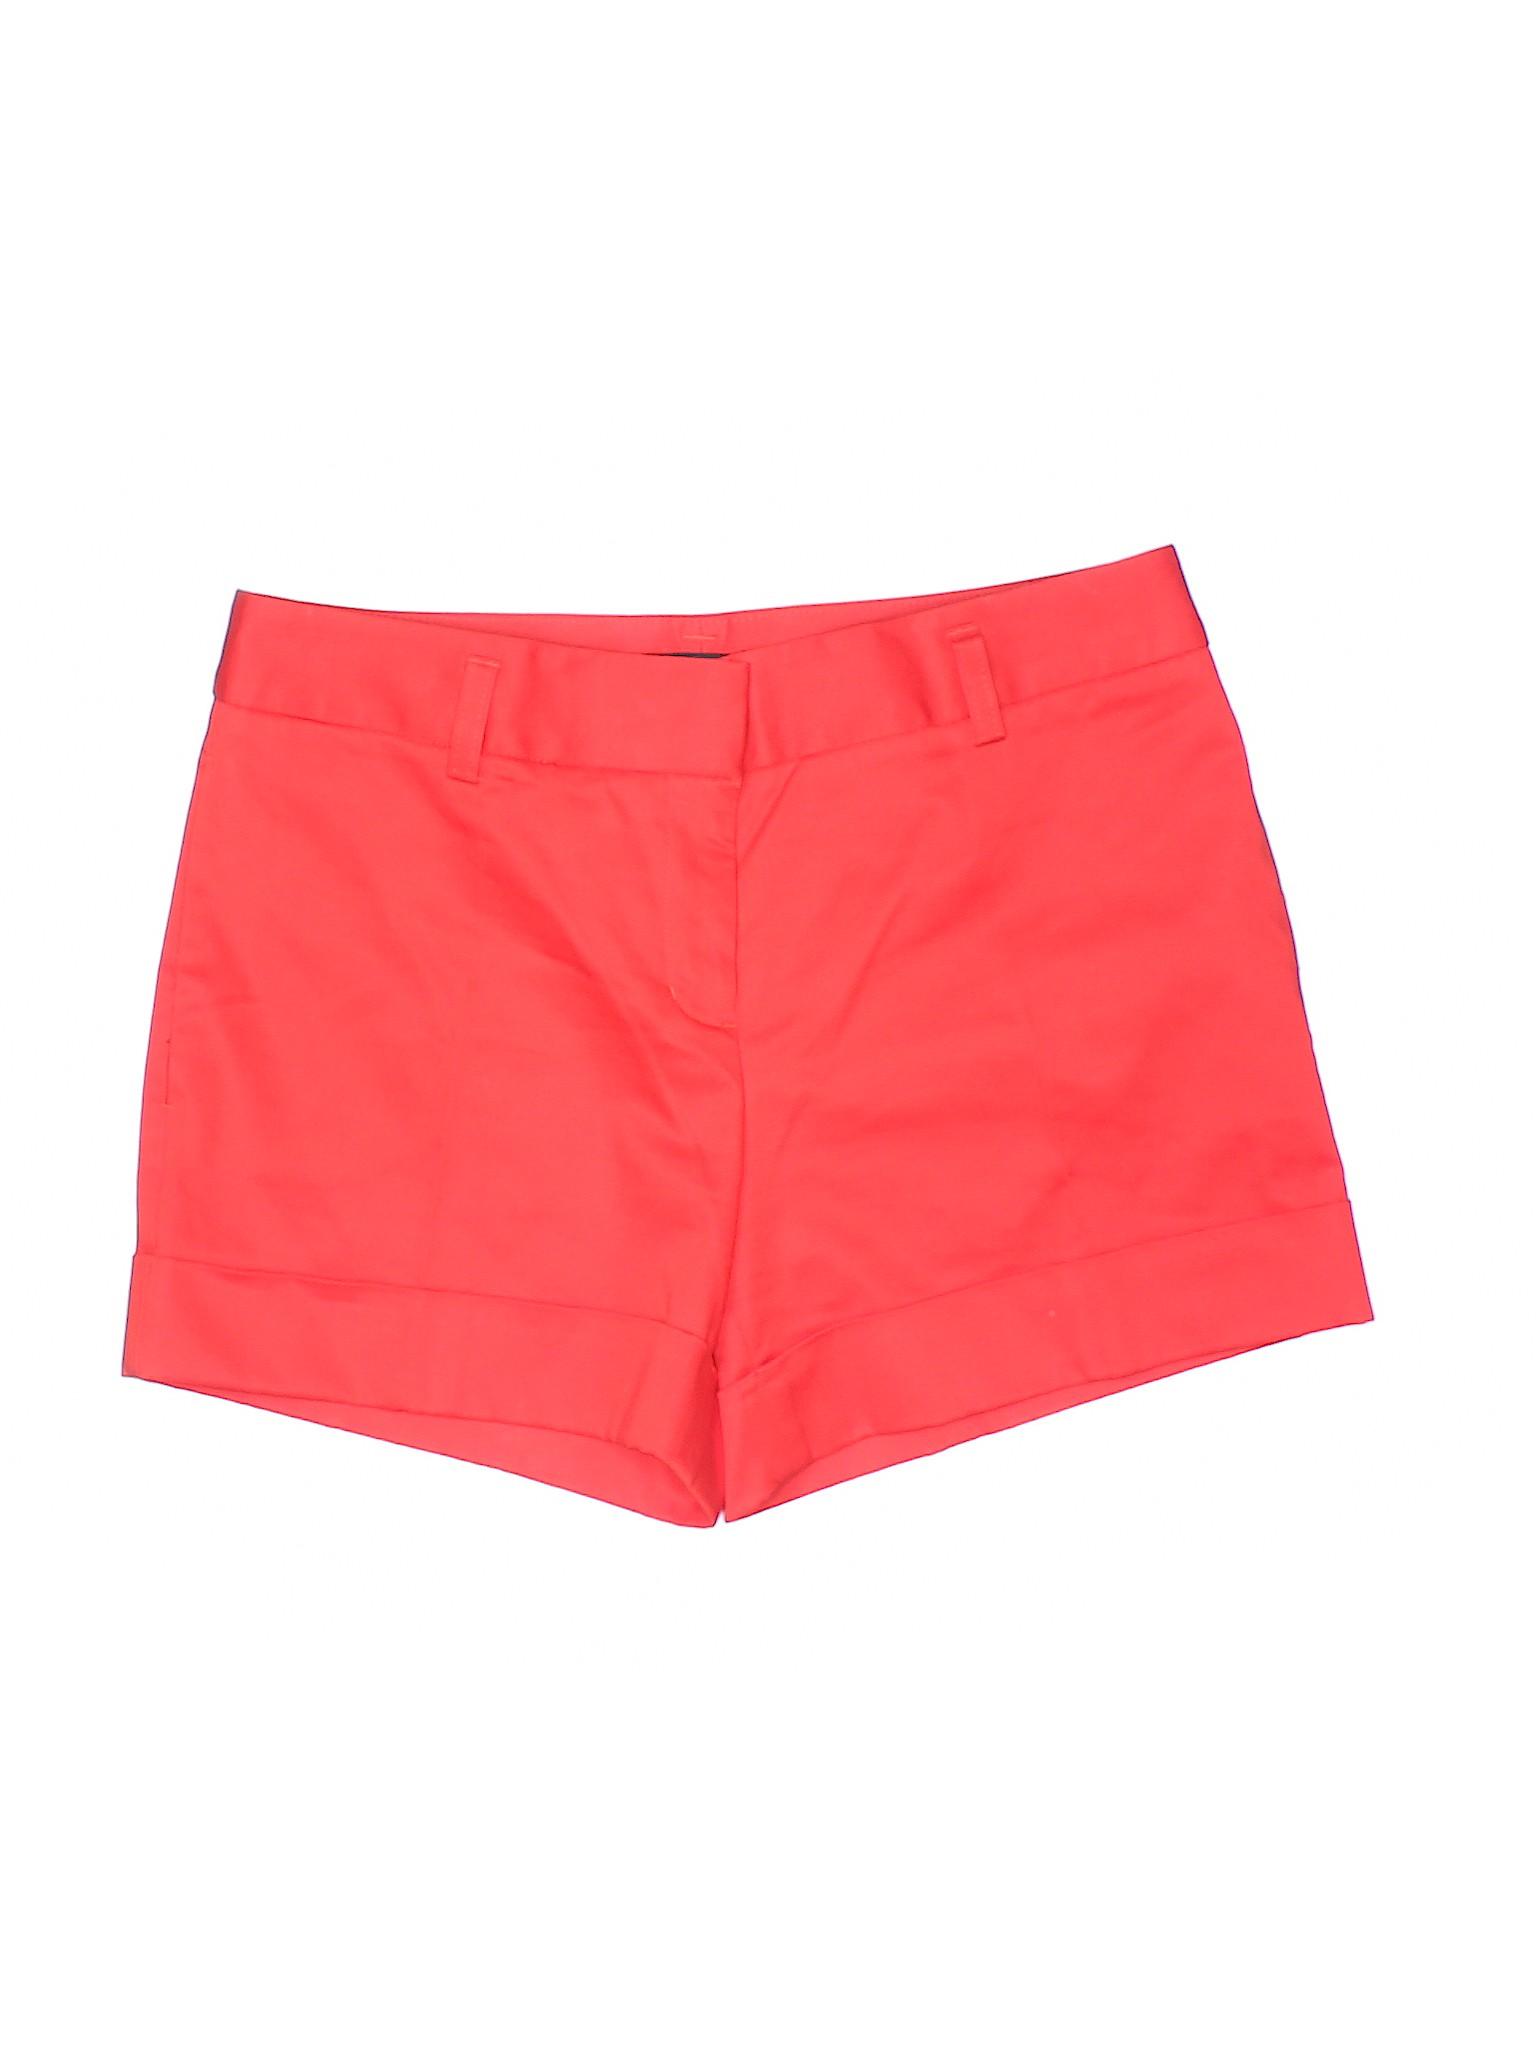 Shorts Express Khaki Boutique Express Khaki Boutique wnXwWqT0F